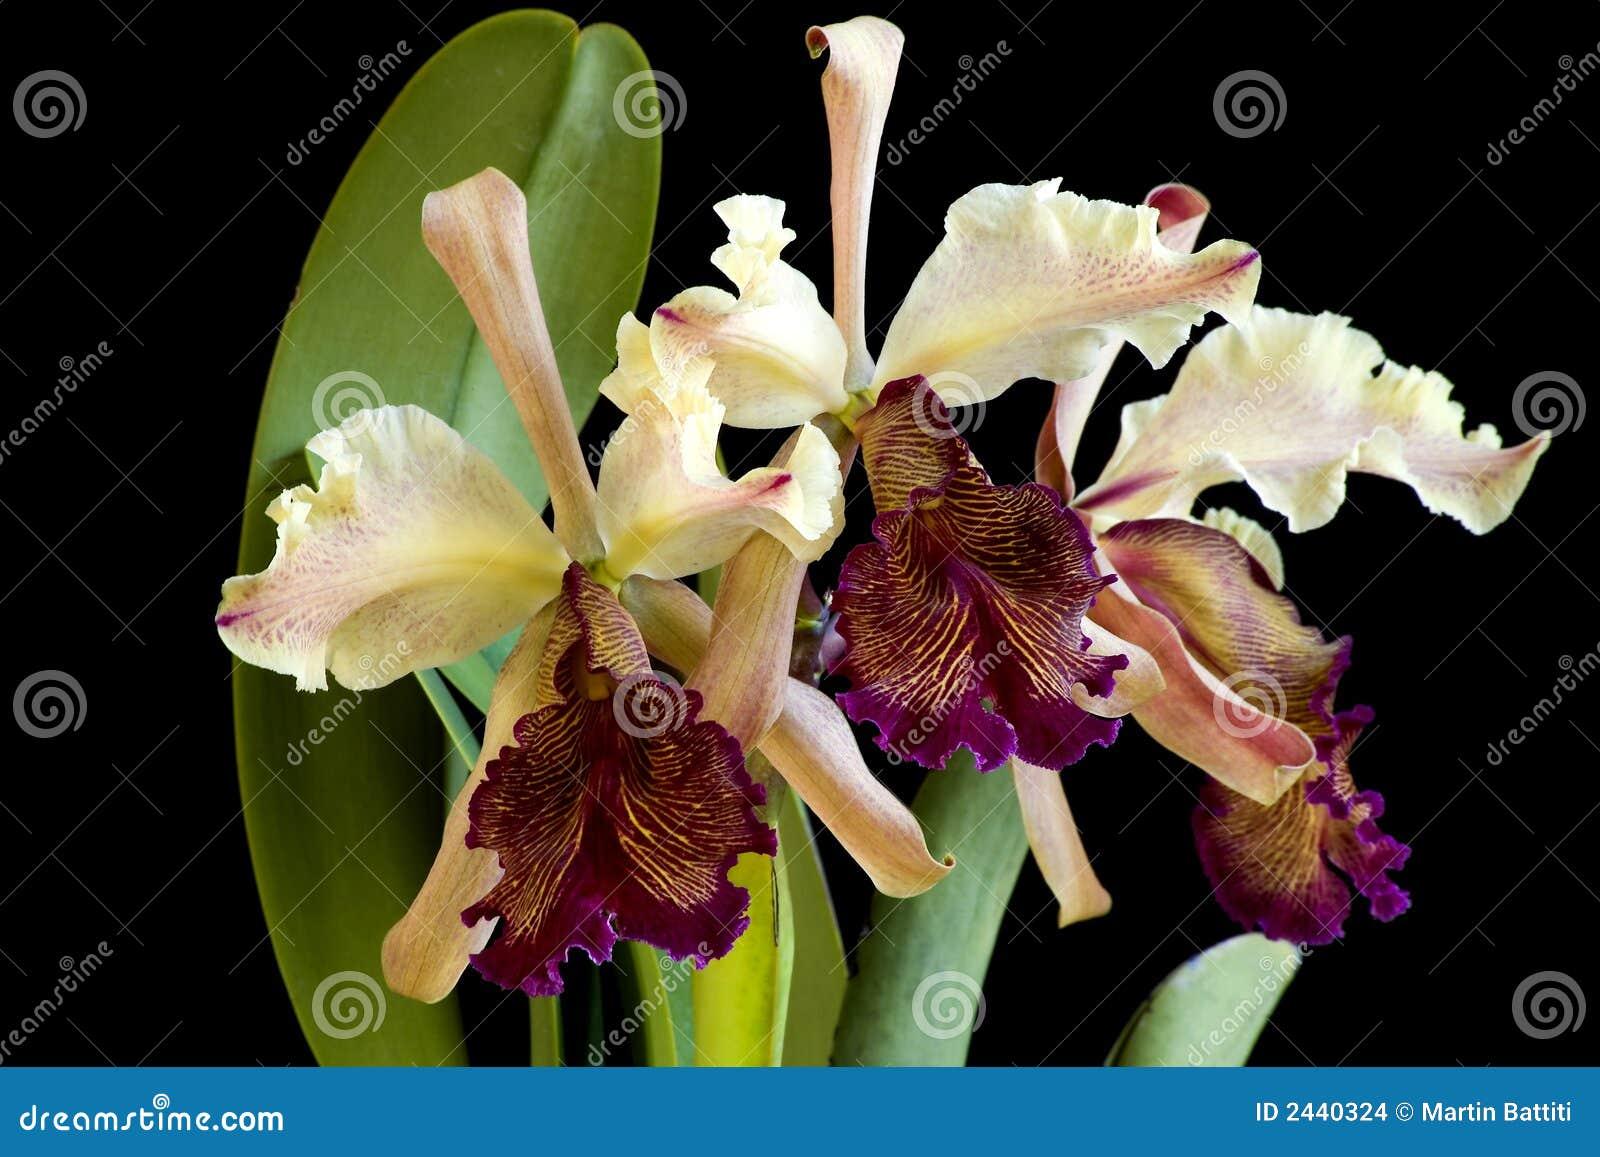 Dowiana orchidea